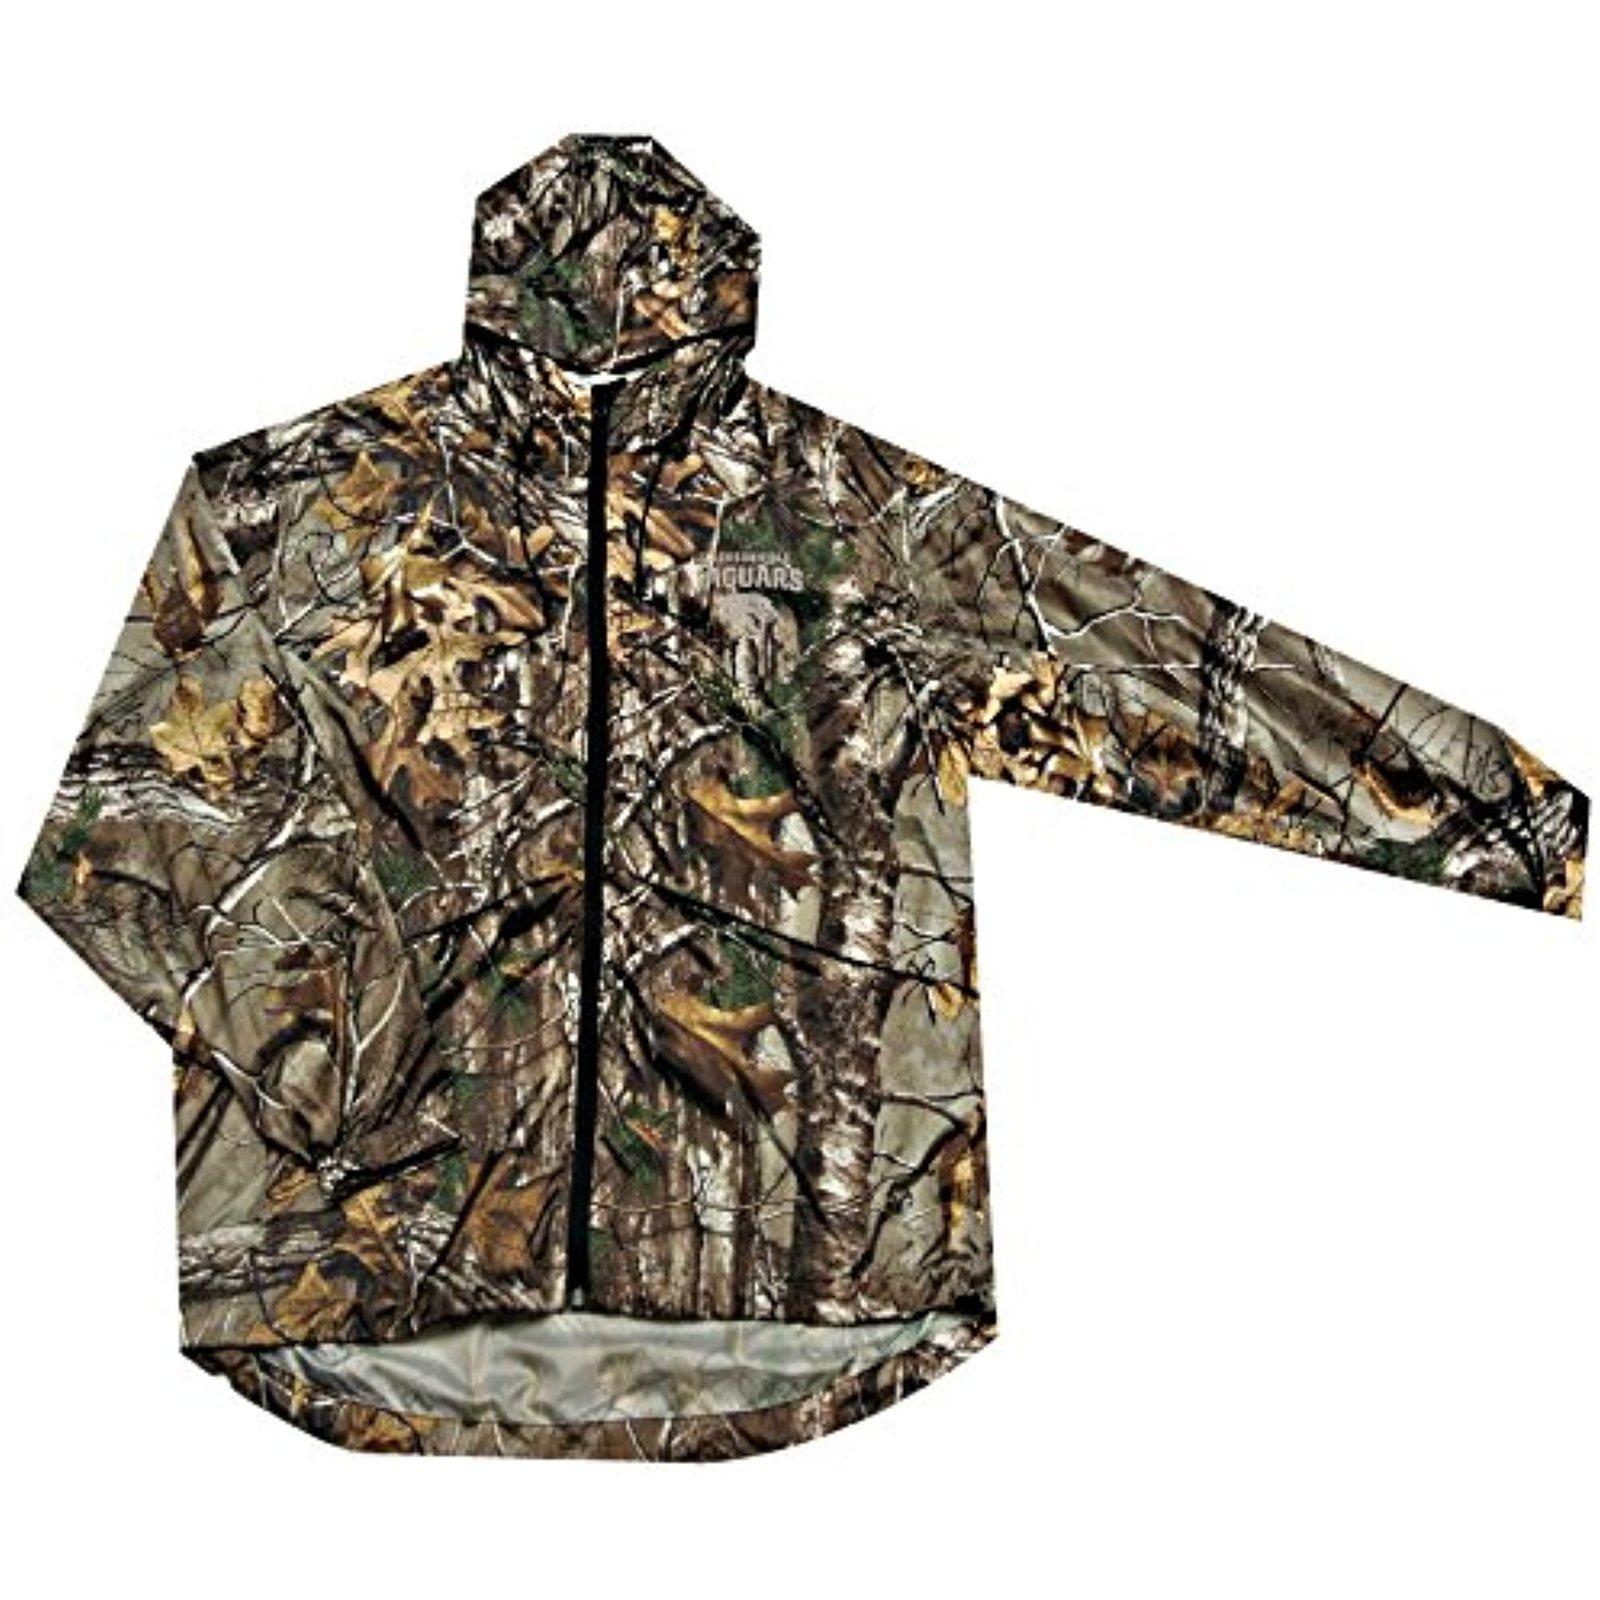 NFL Jacksonville Jaguars Sportsman Windbreaker Jacket, Real Tree Camo, Large